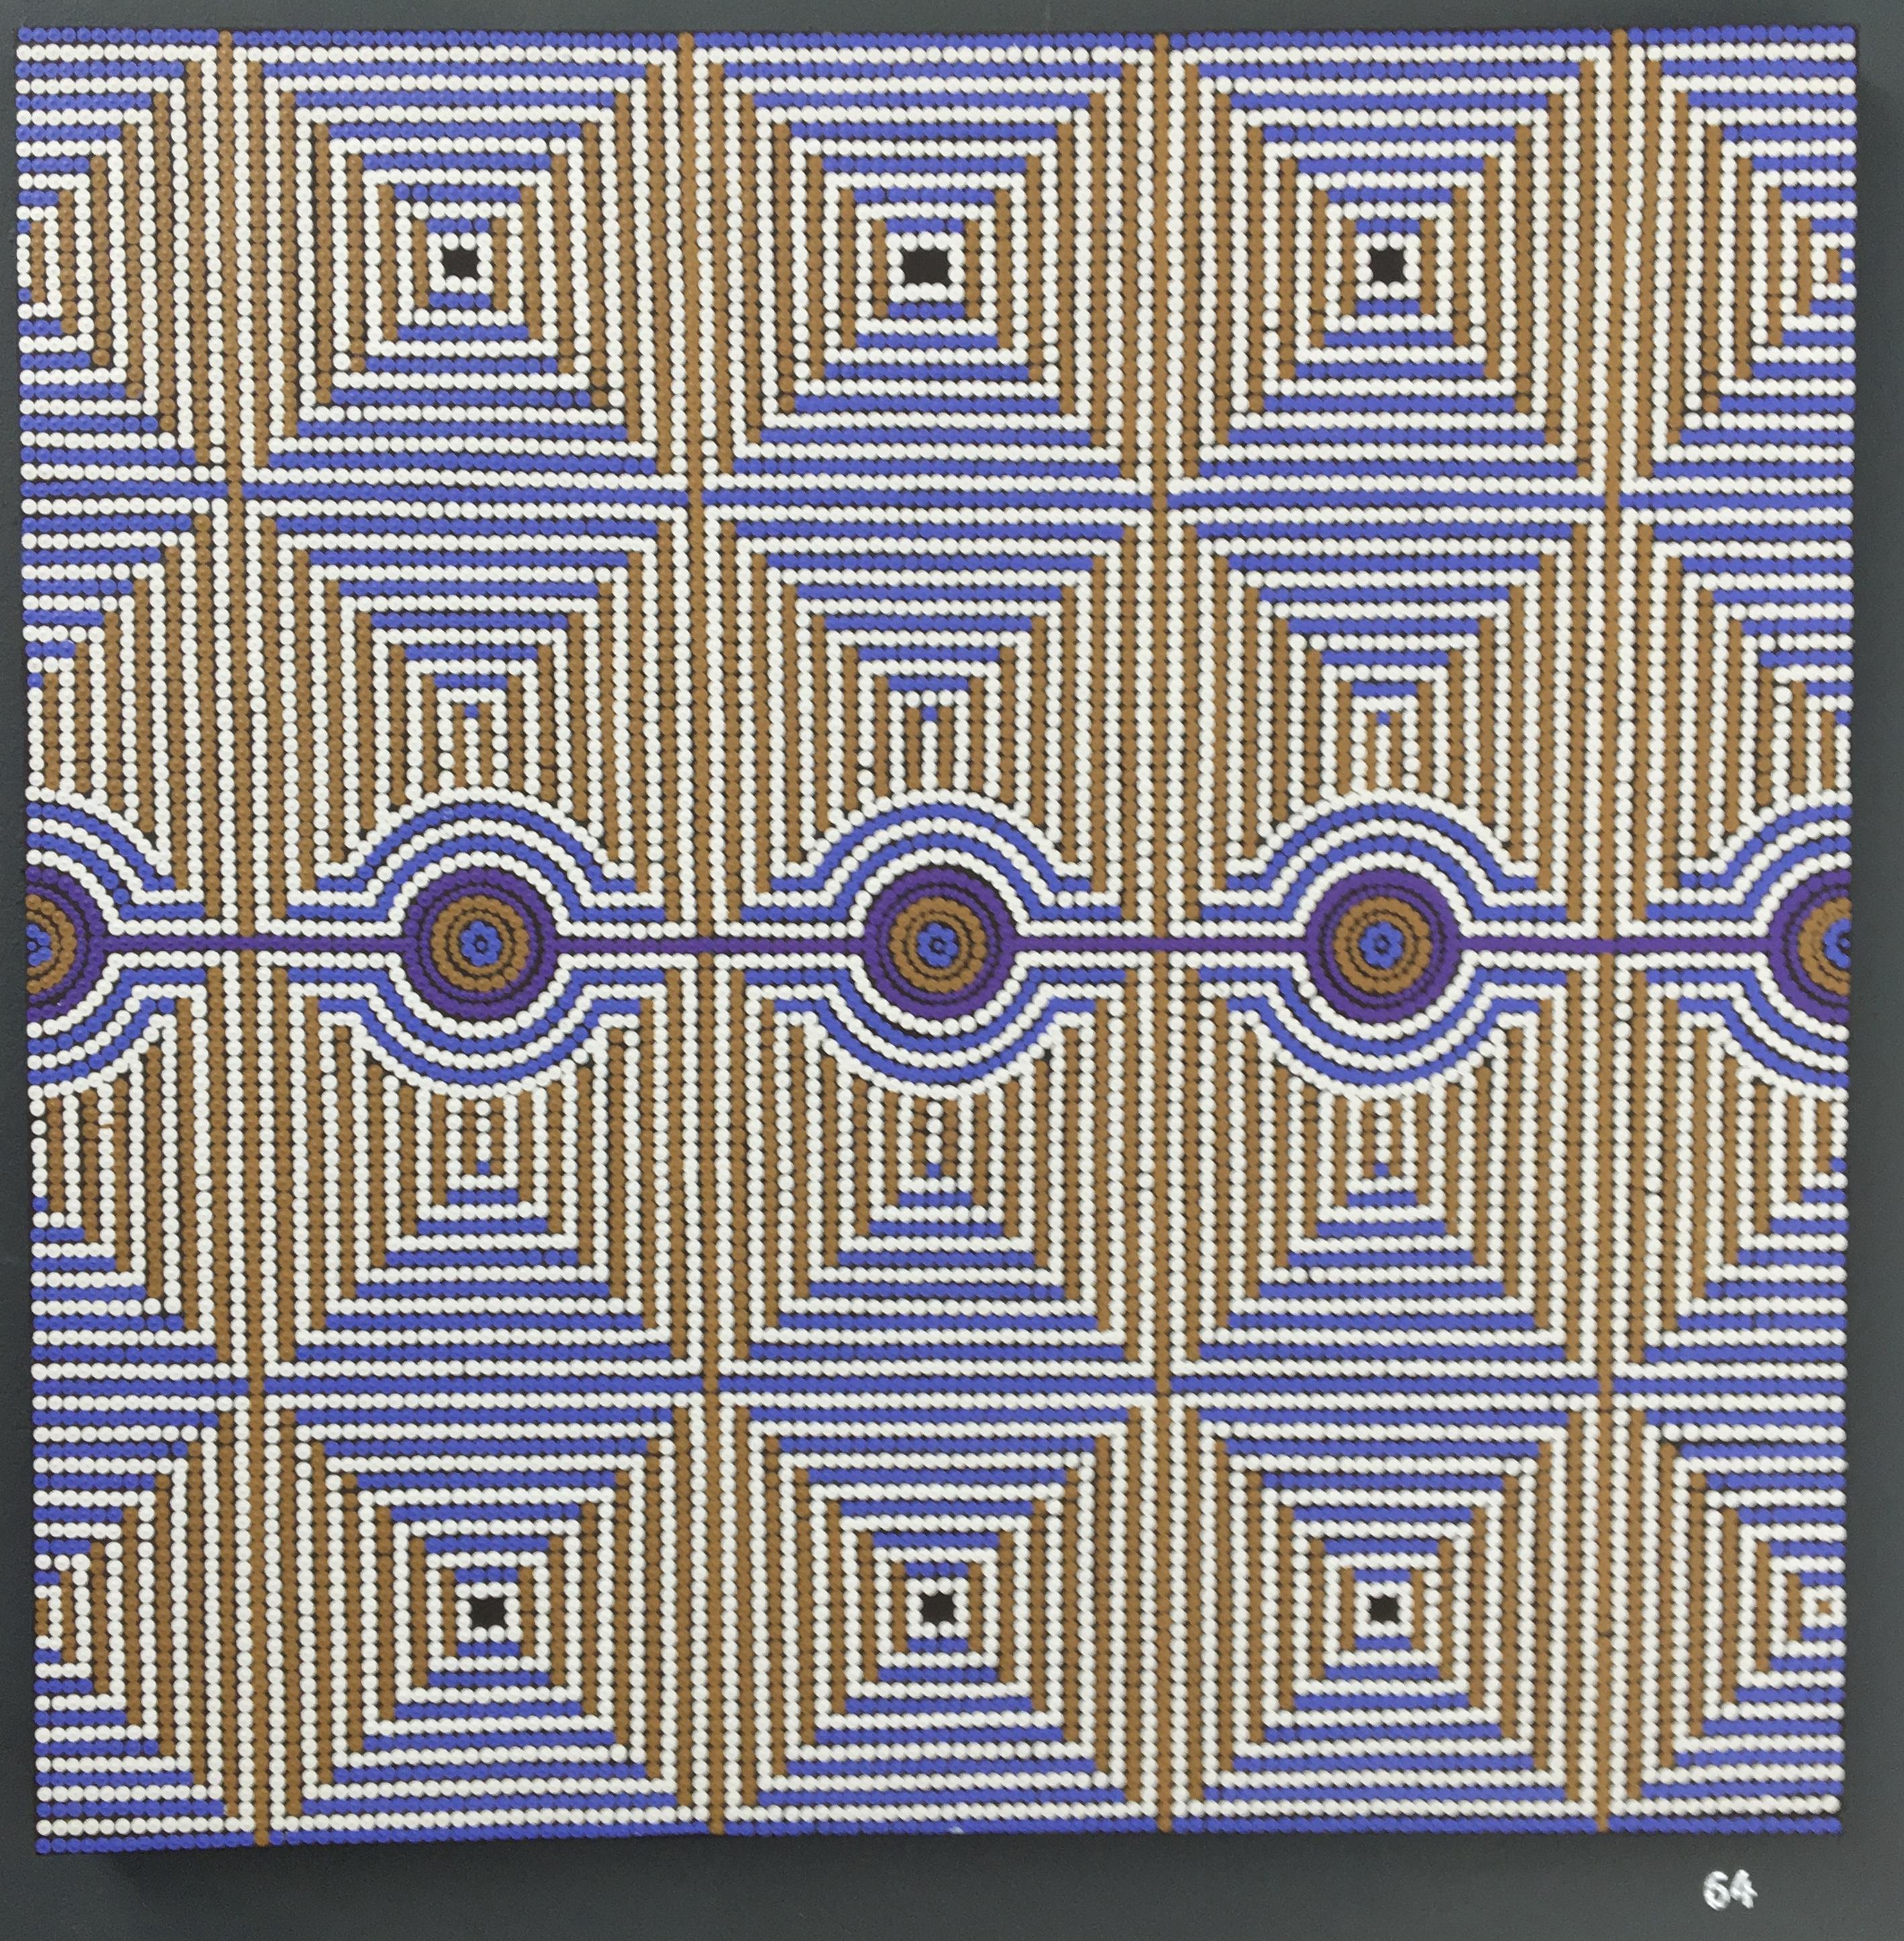 64. Untitled, Shaun Cole, 90 x 90 x 3, £150